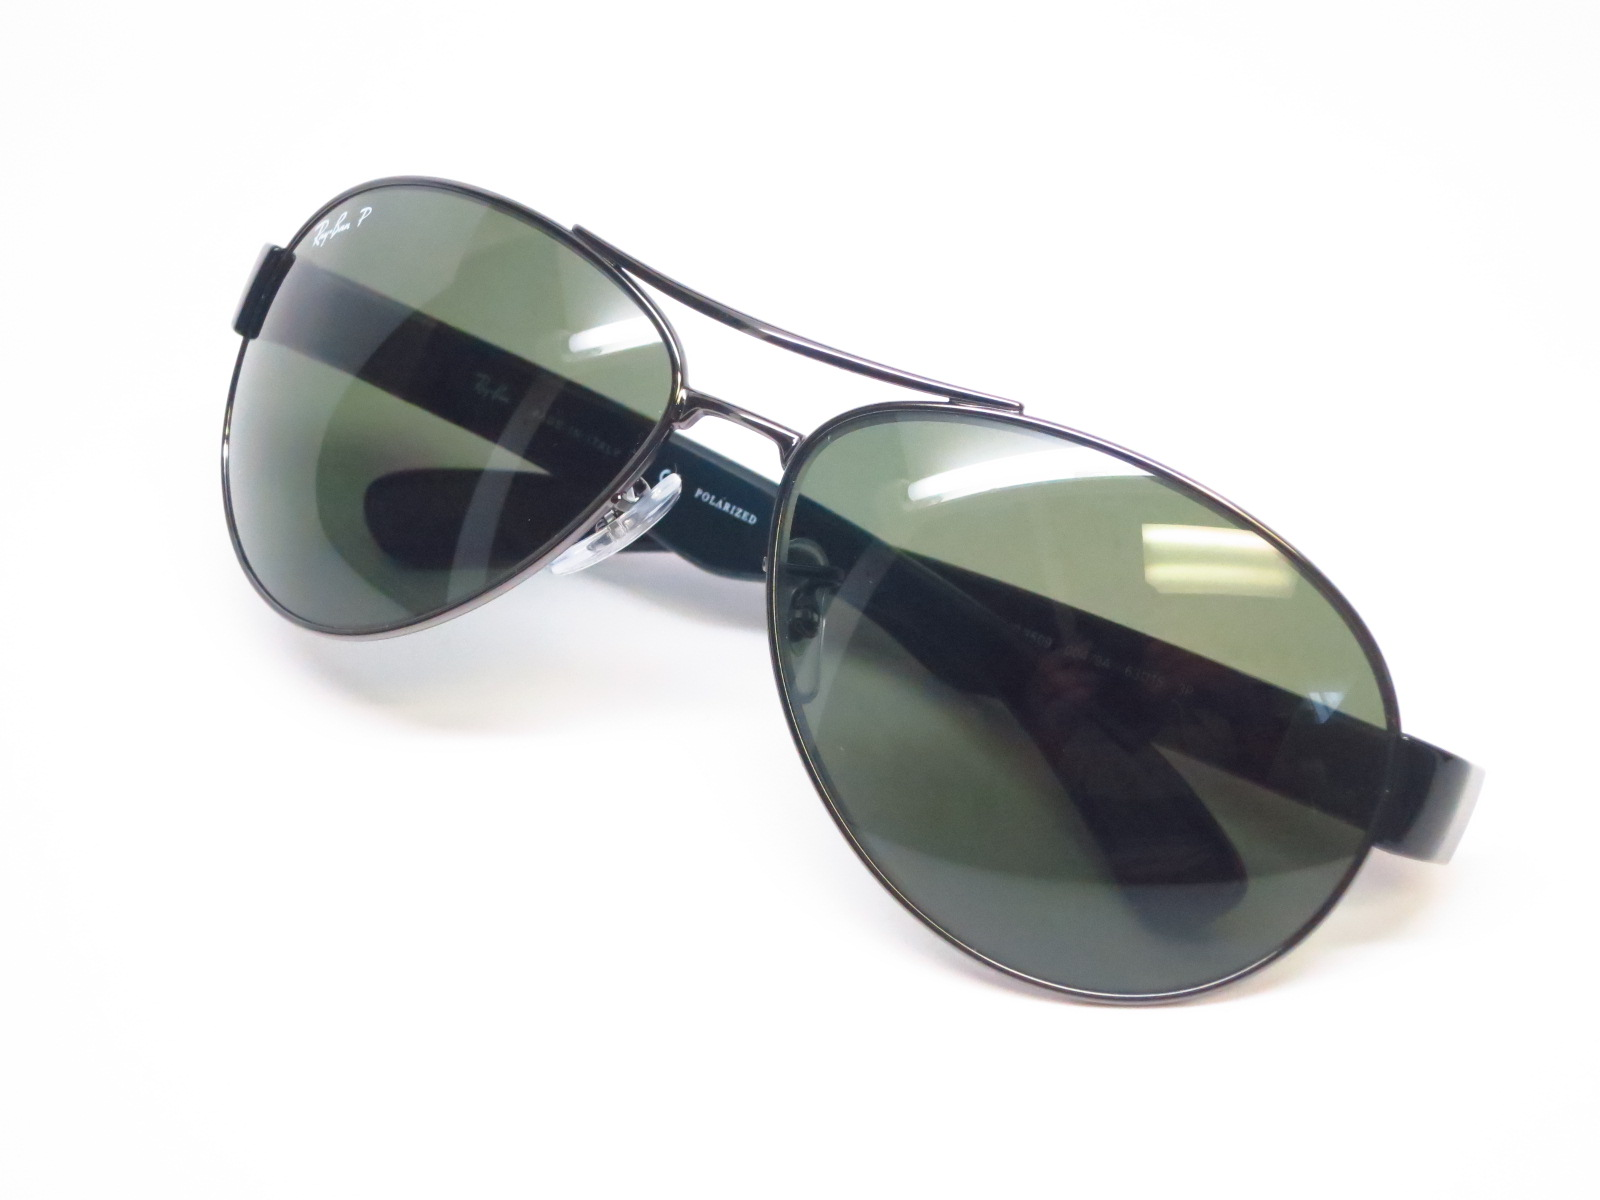 628e3aac67 Ray-Ban RB 3509 004 9A Gunmetal Polarized Sunglasses